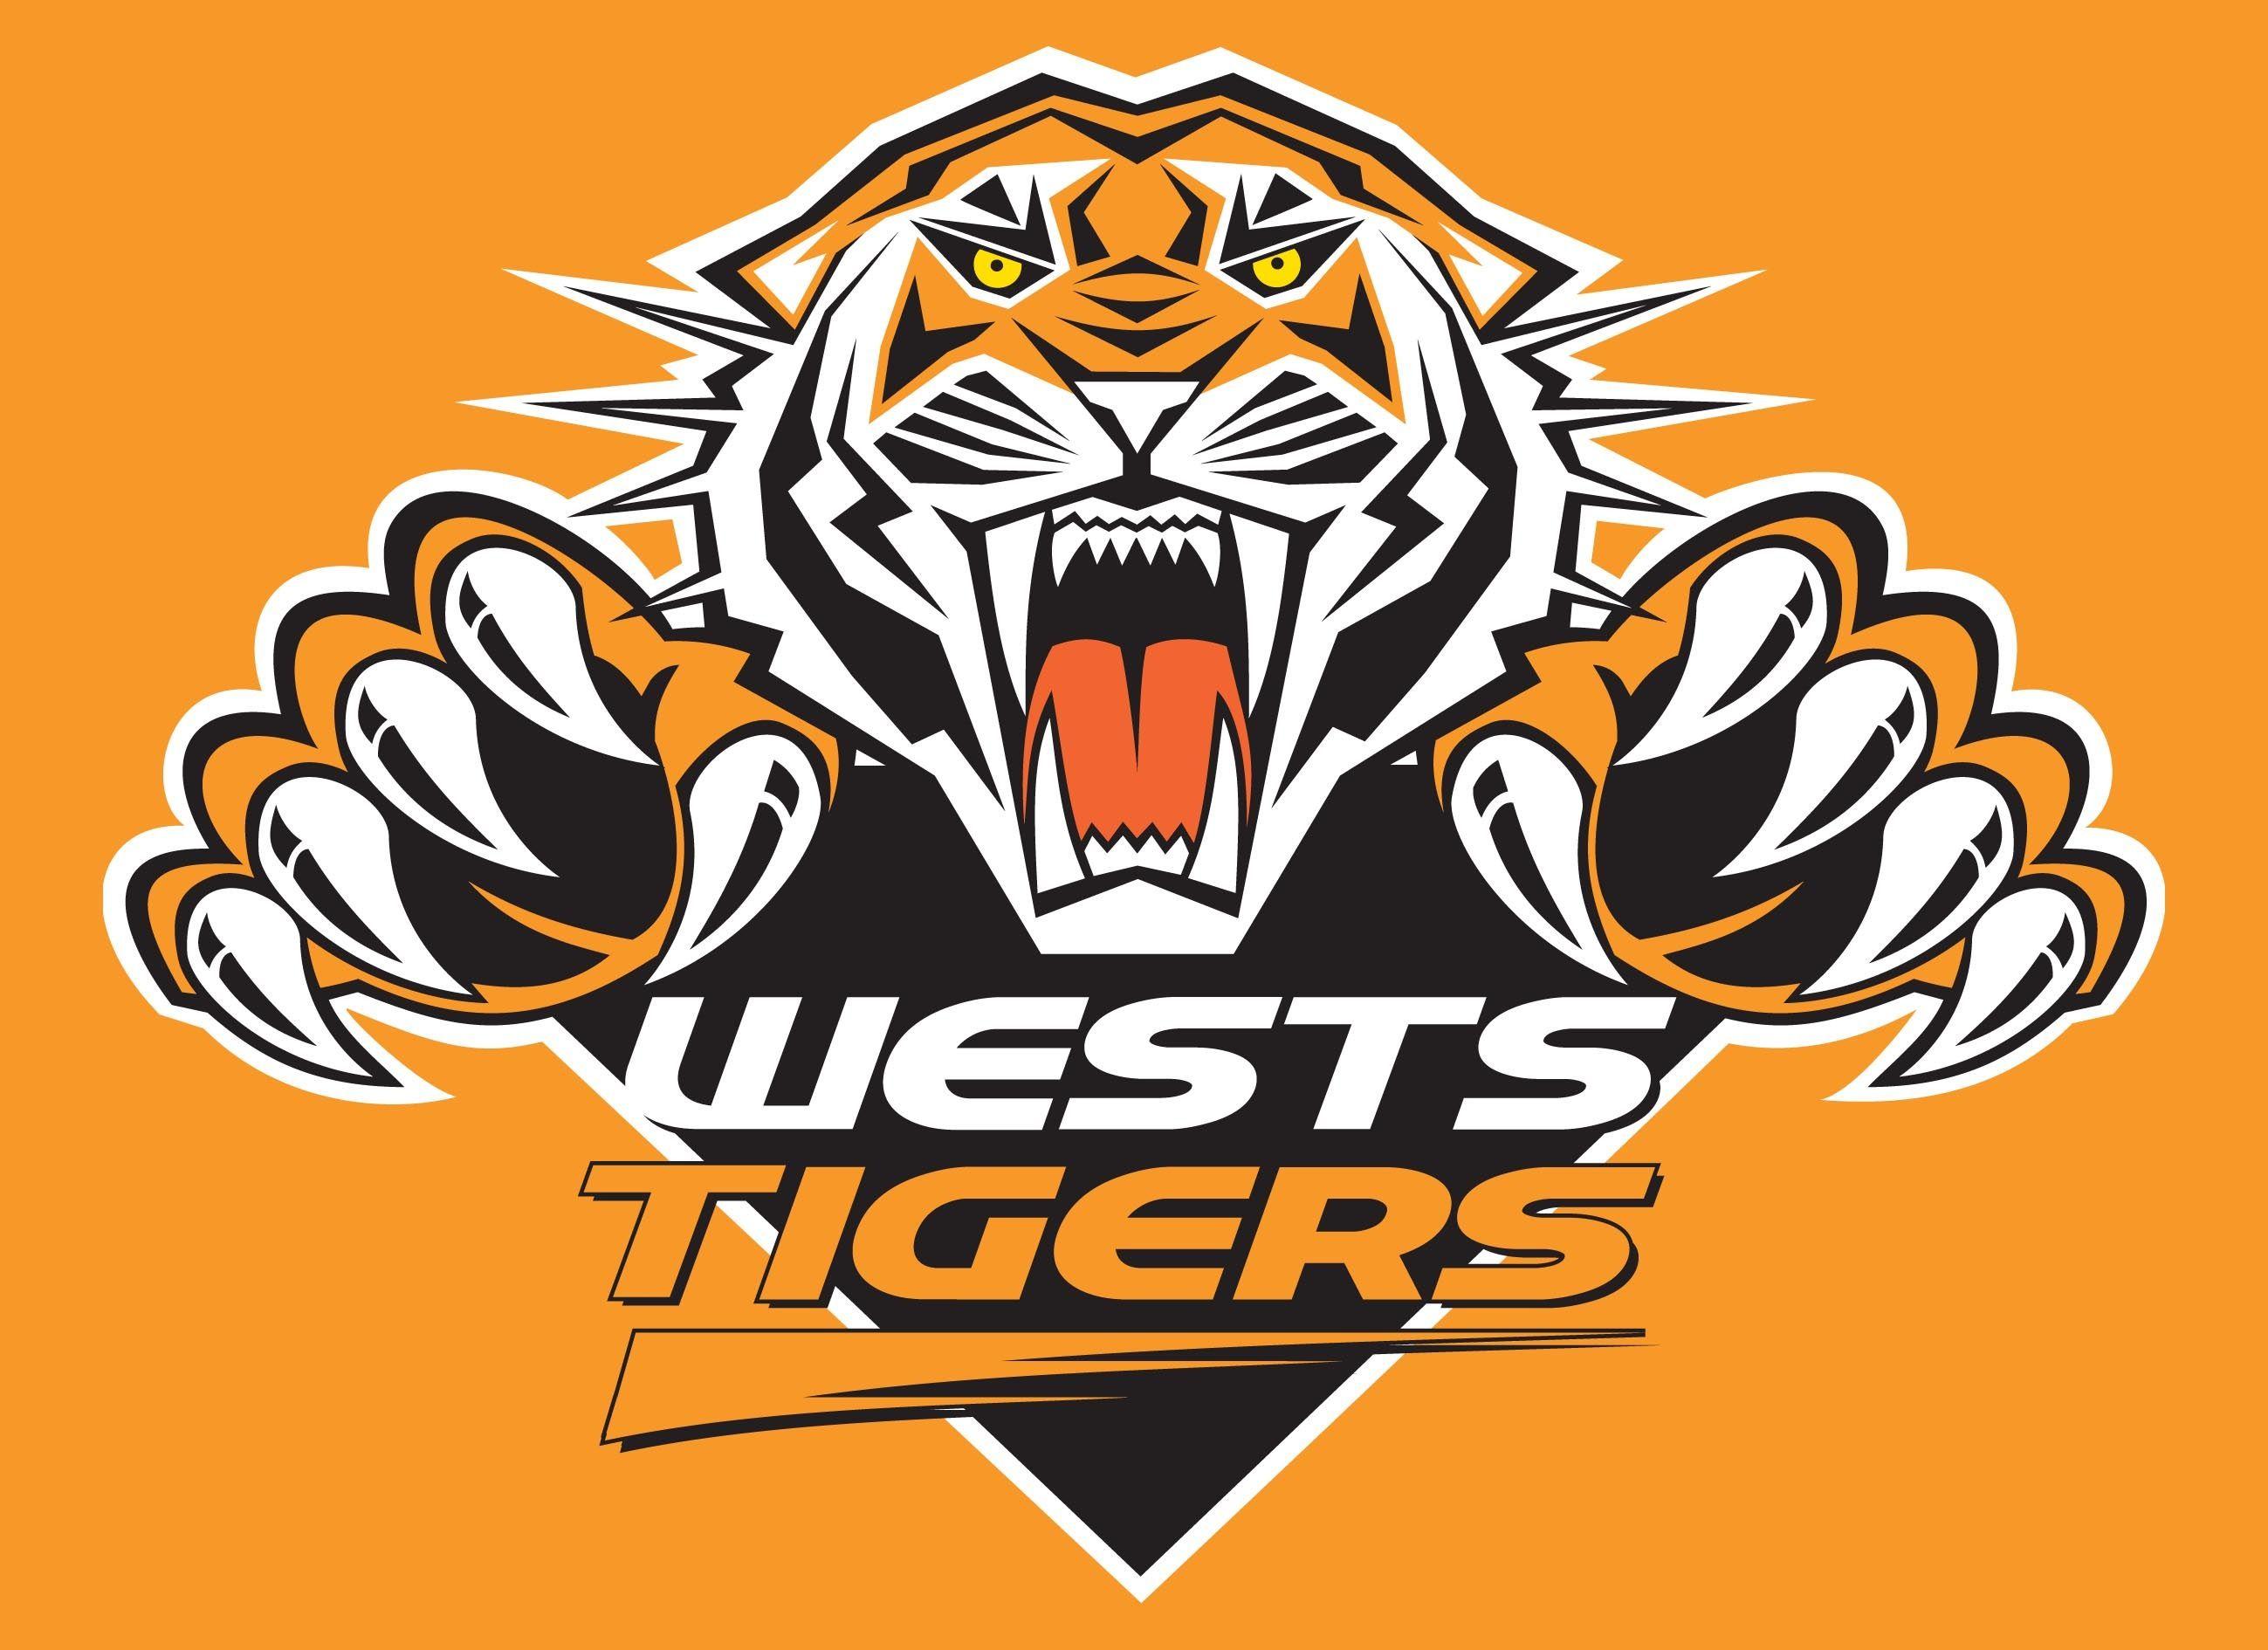 west tigers that s my team pinterest tigers rh pinterest com logo tigre foot college football tiger logos